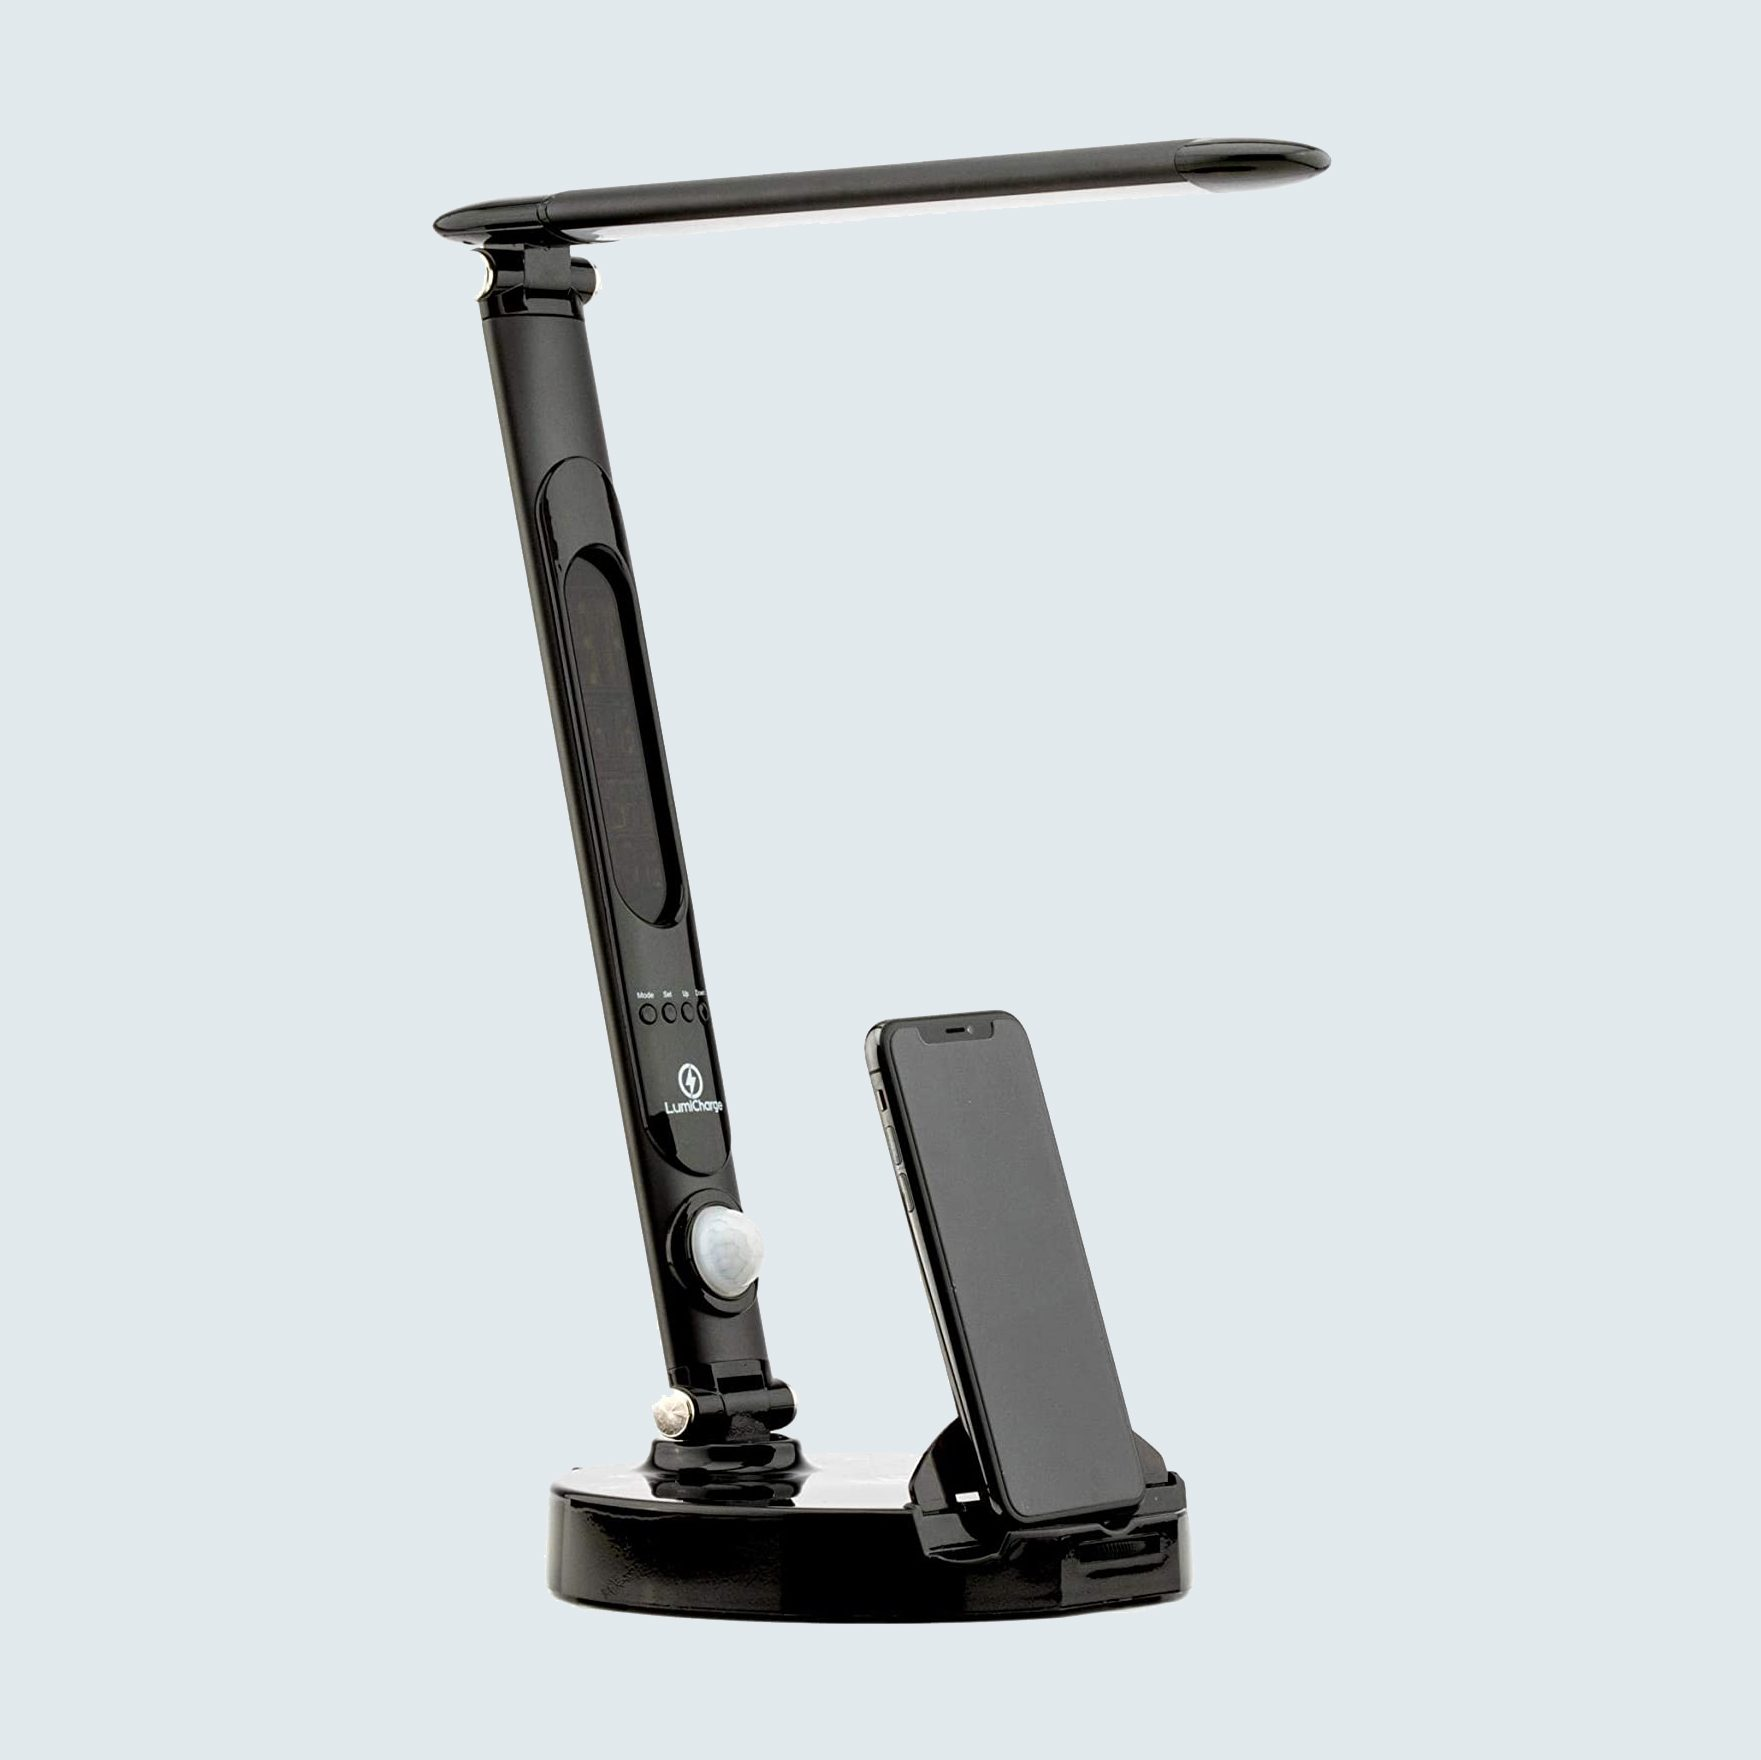 LumiCharge LED Smart Adjustable Desk Lamp